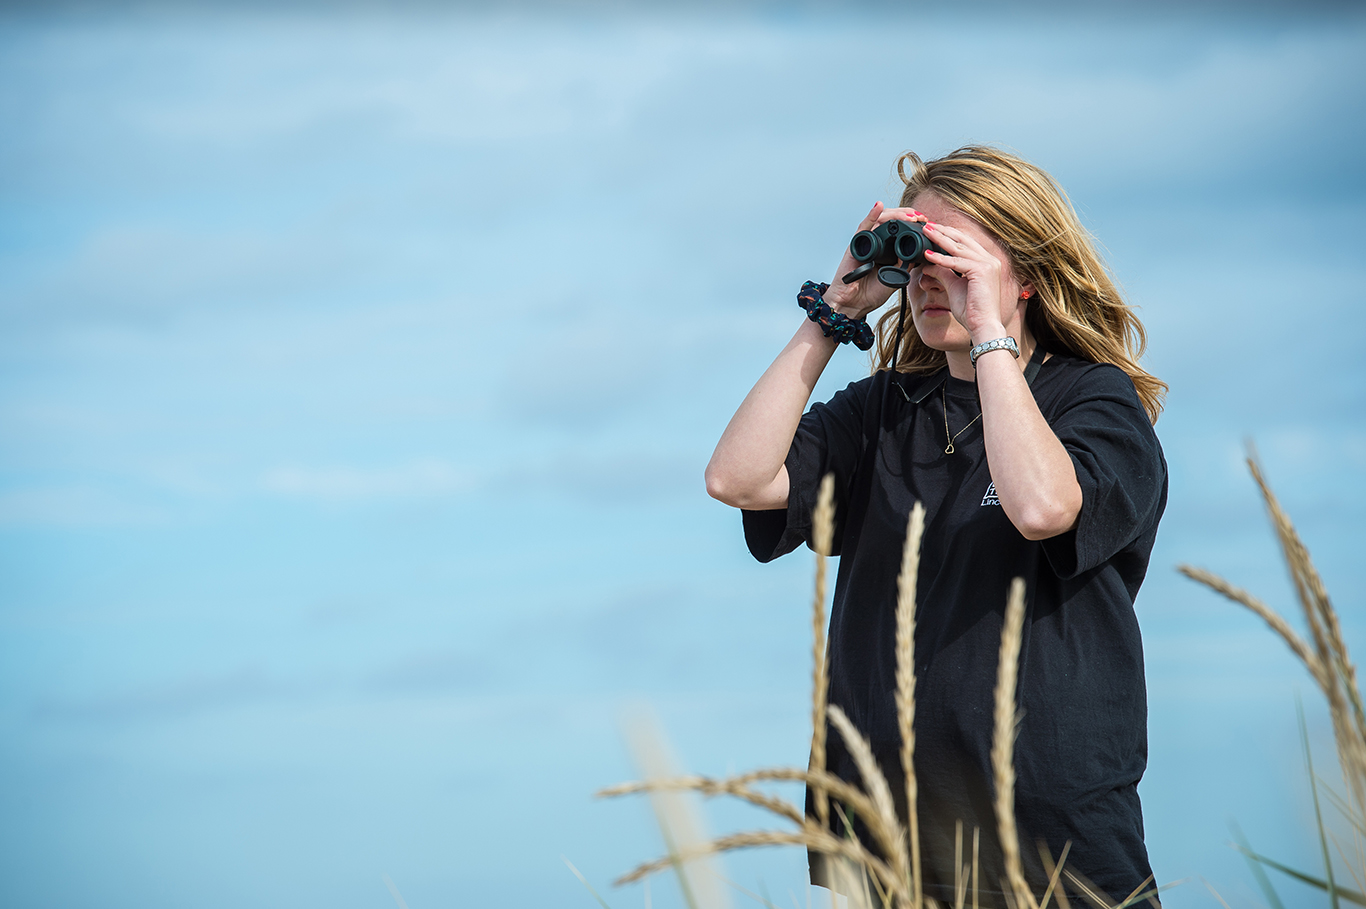 Watching wildlife has been shown to increase happiness (Photo: Matthew Roberts).